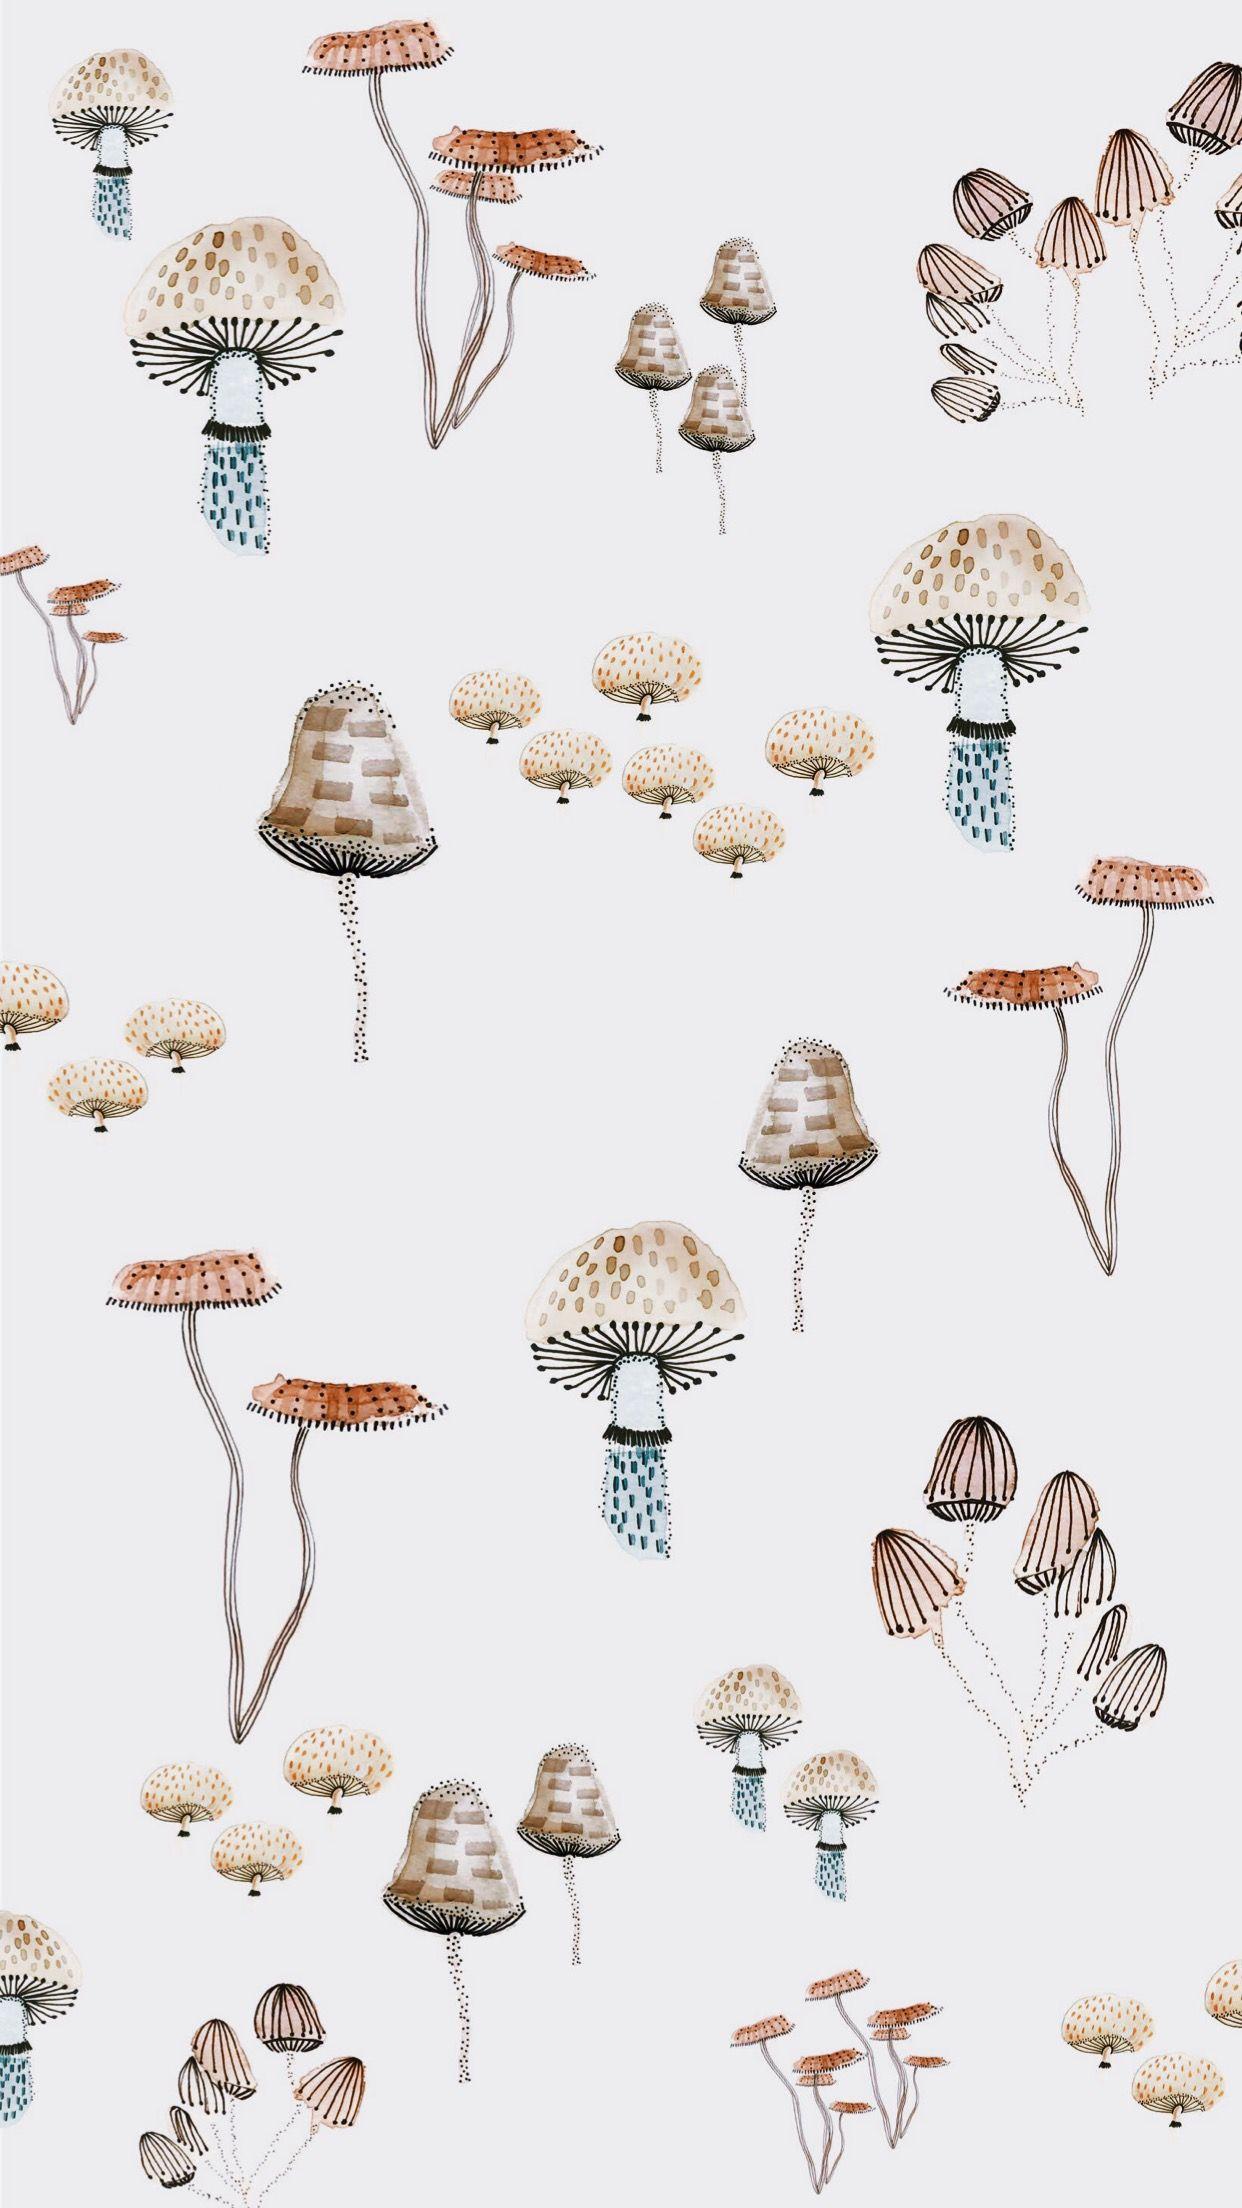 Woodland Mushroom Iphone Wallpaper By Claira Gresham Wallpaper Iphonewallpaper Mushrooms W Mushroom Wallpaper Watercolor Wallpaper Iphone Iphone Wallpaper